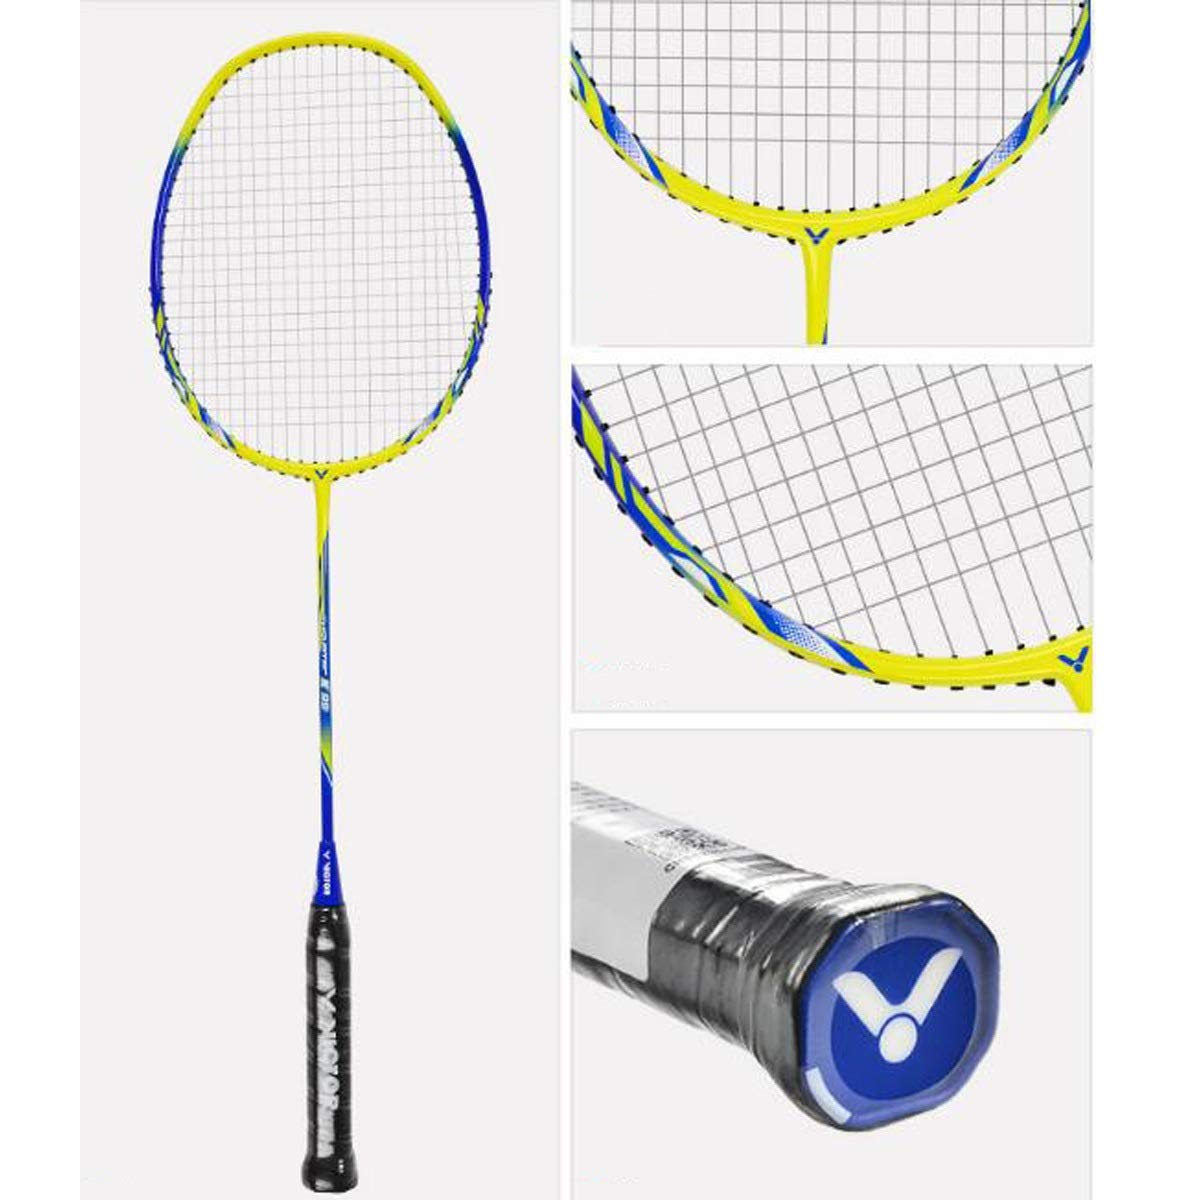 Tongboshi Badminton Racket, Double Shot, Offensive Full Carbon Badminton Racket, Aluminum Alloy Badminton Racket Badminton Racket, (Edition : C) by Tongboshi (Image #3)